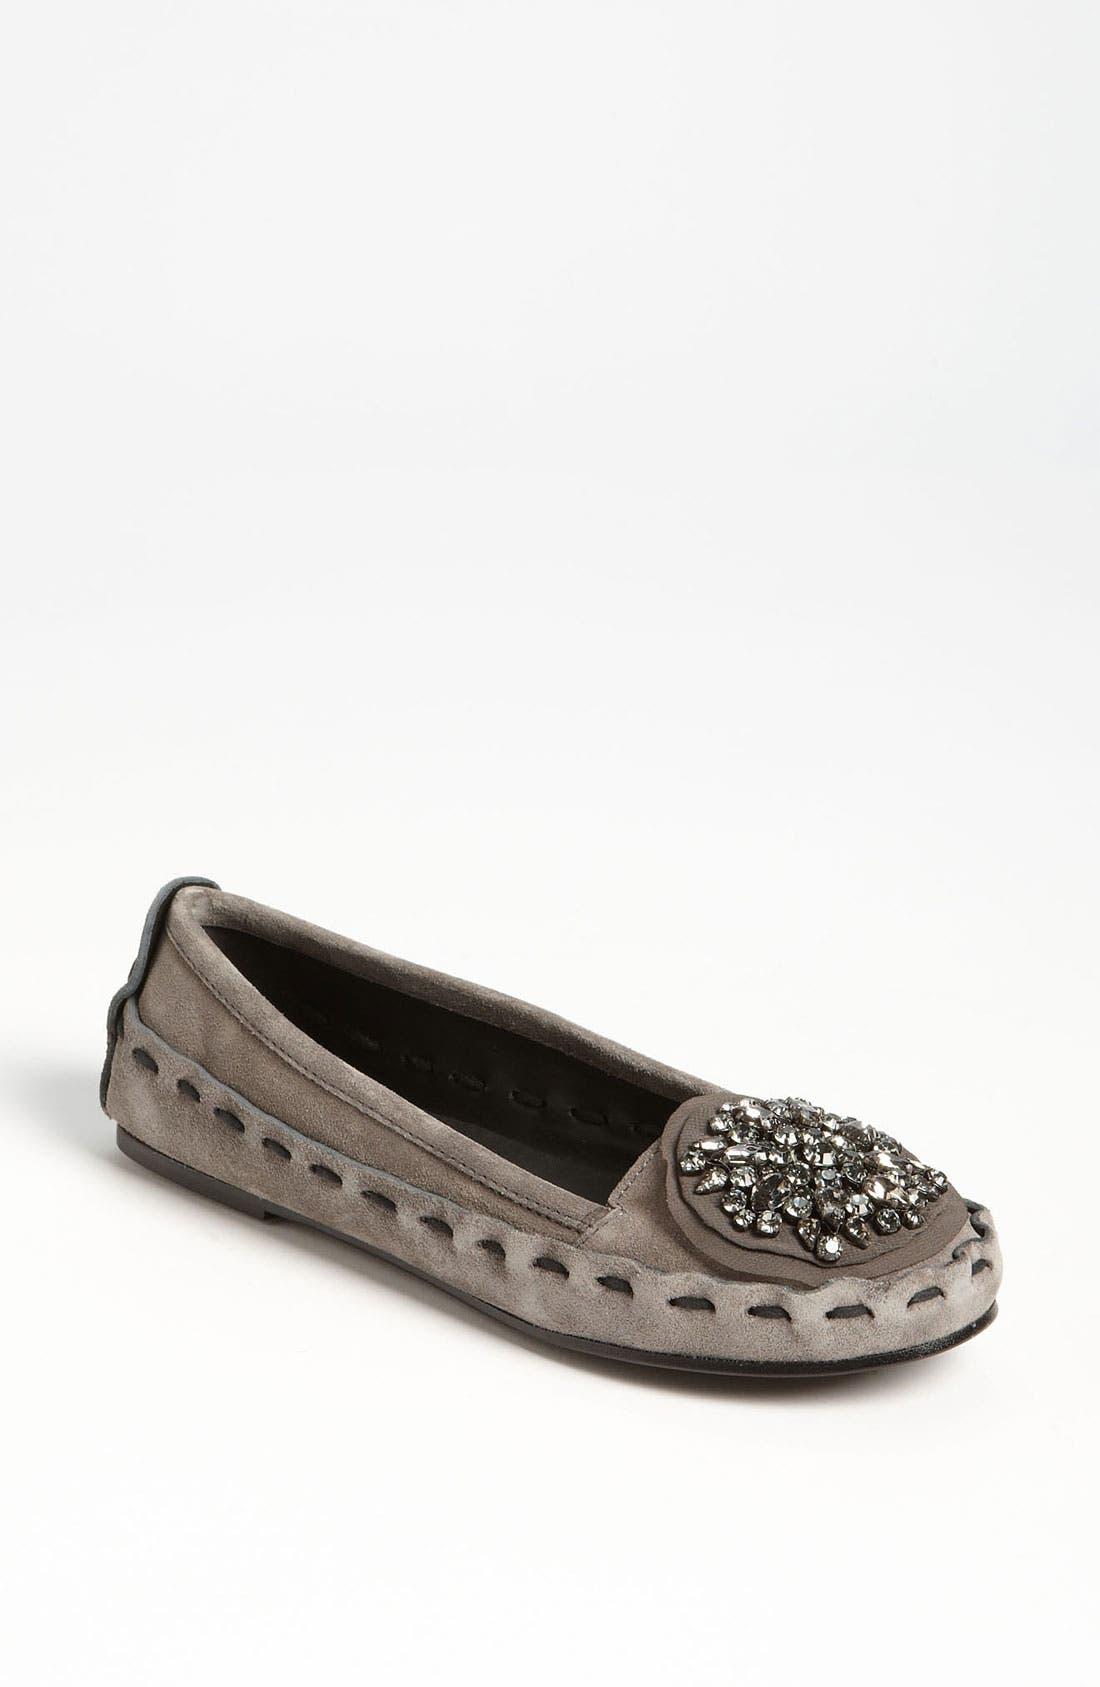 Alternate Image 1 Selected - Vera Wang Footwear 'Indigo' Flat